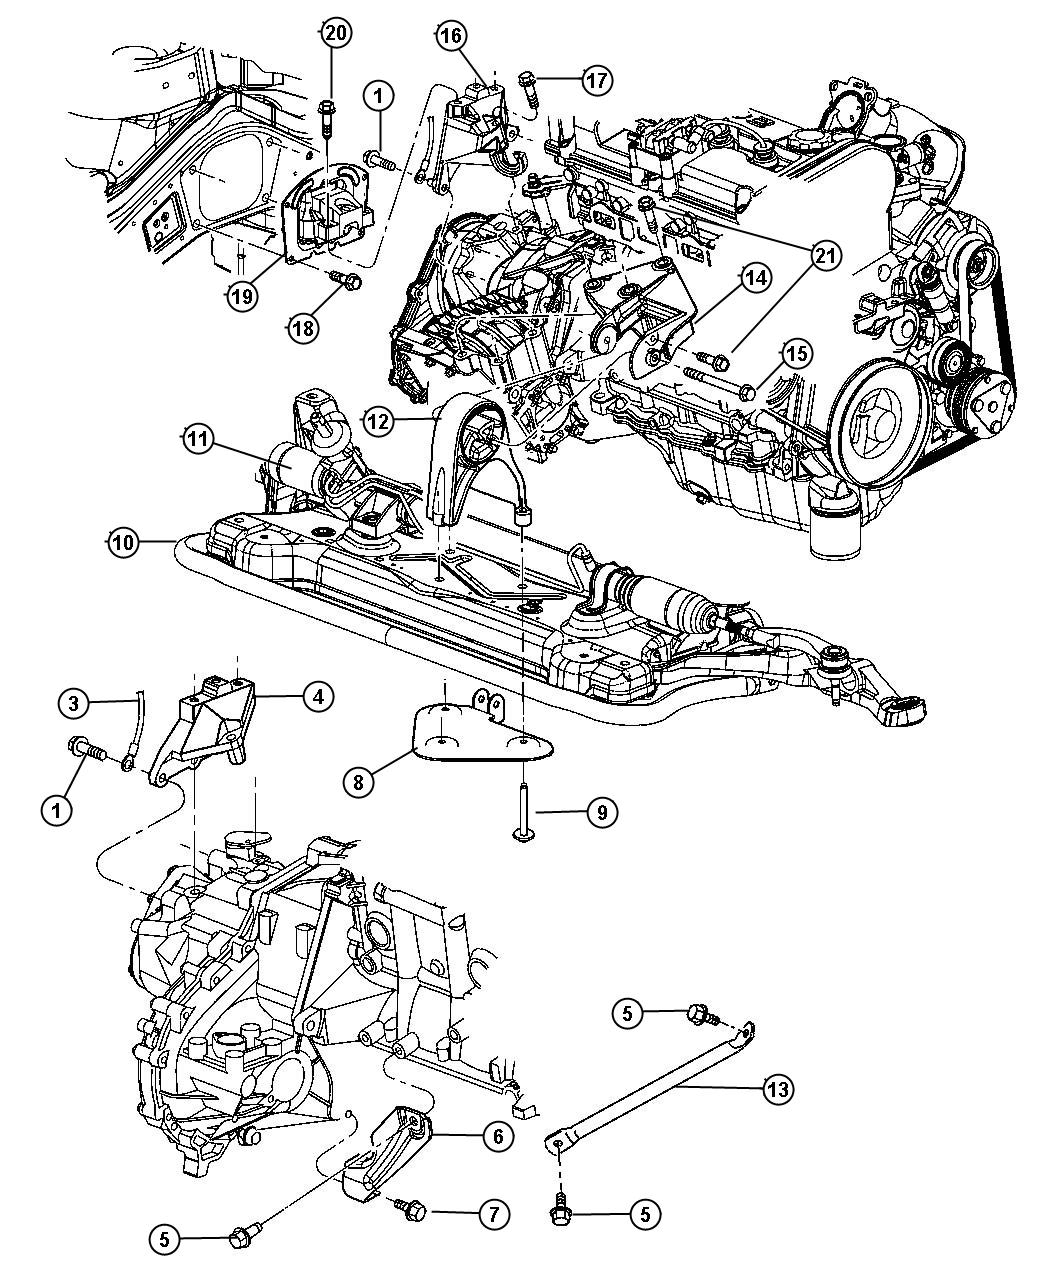 Dodge Stratus Bracket Torque Reaction Engine